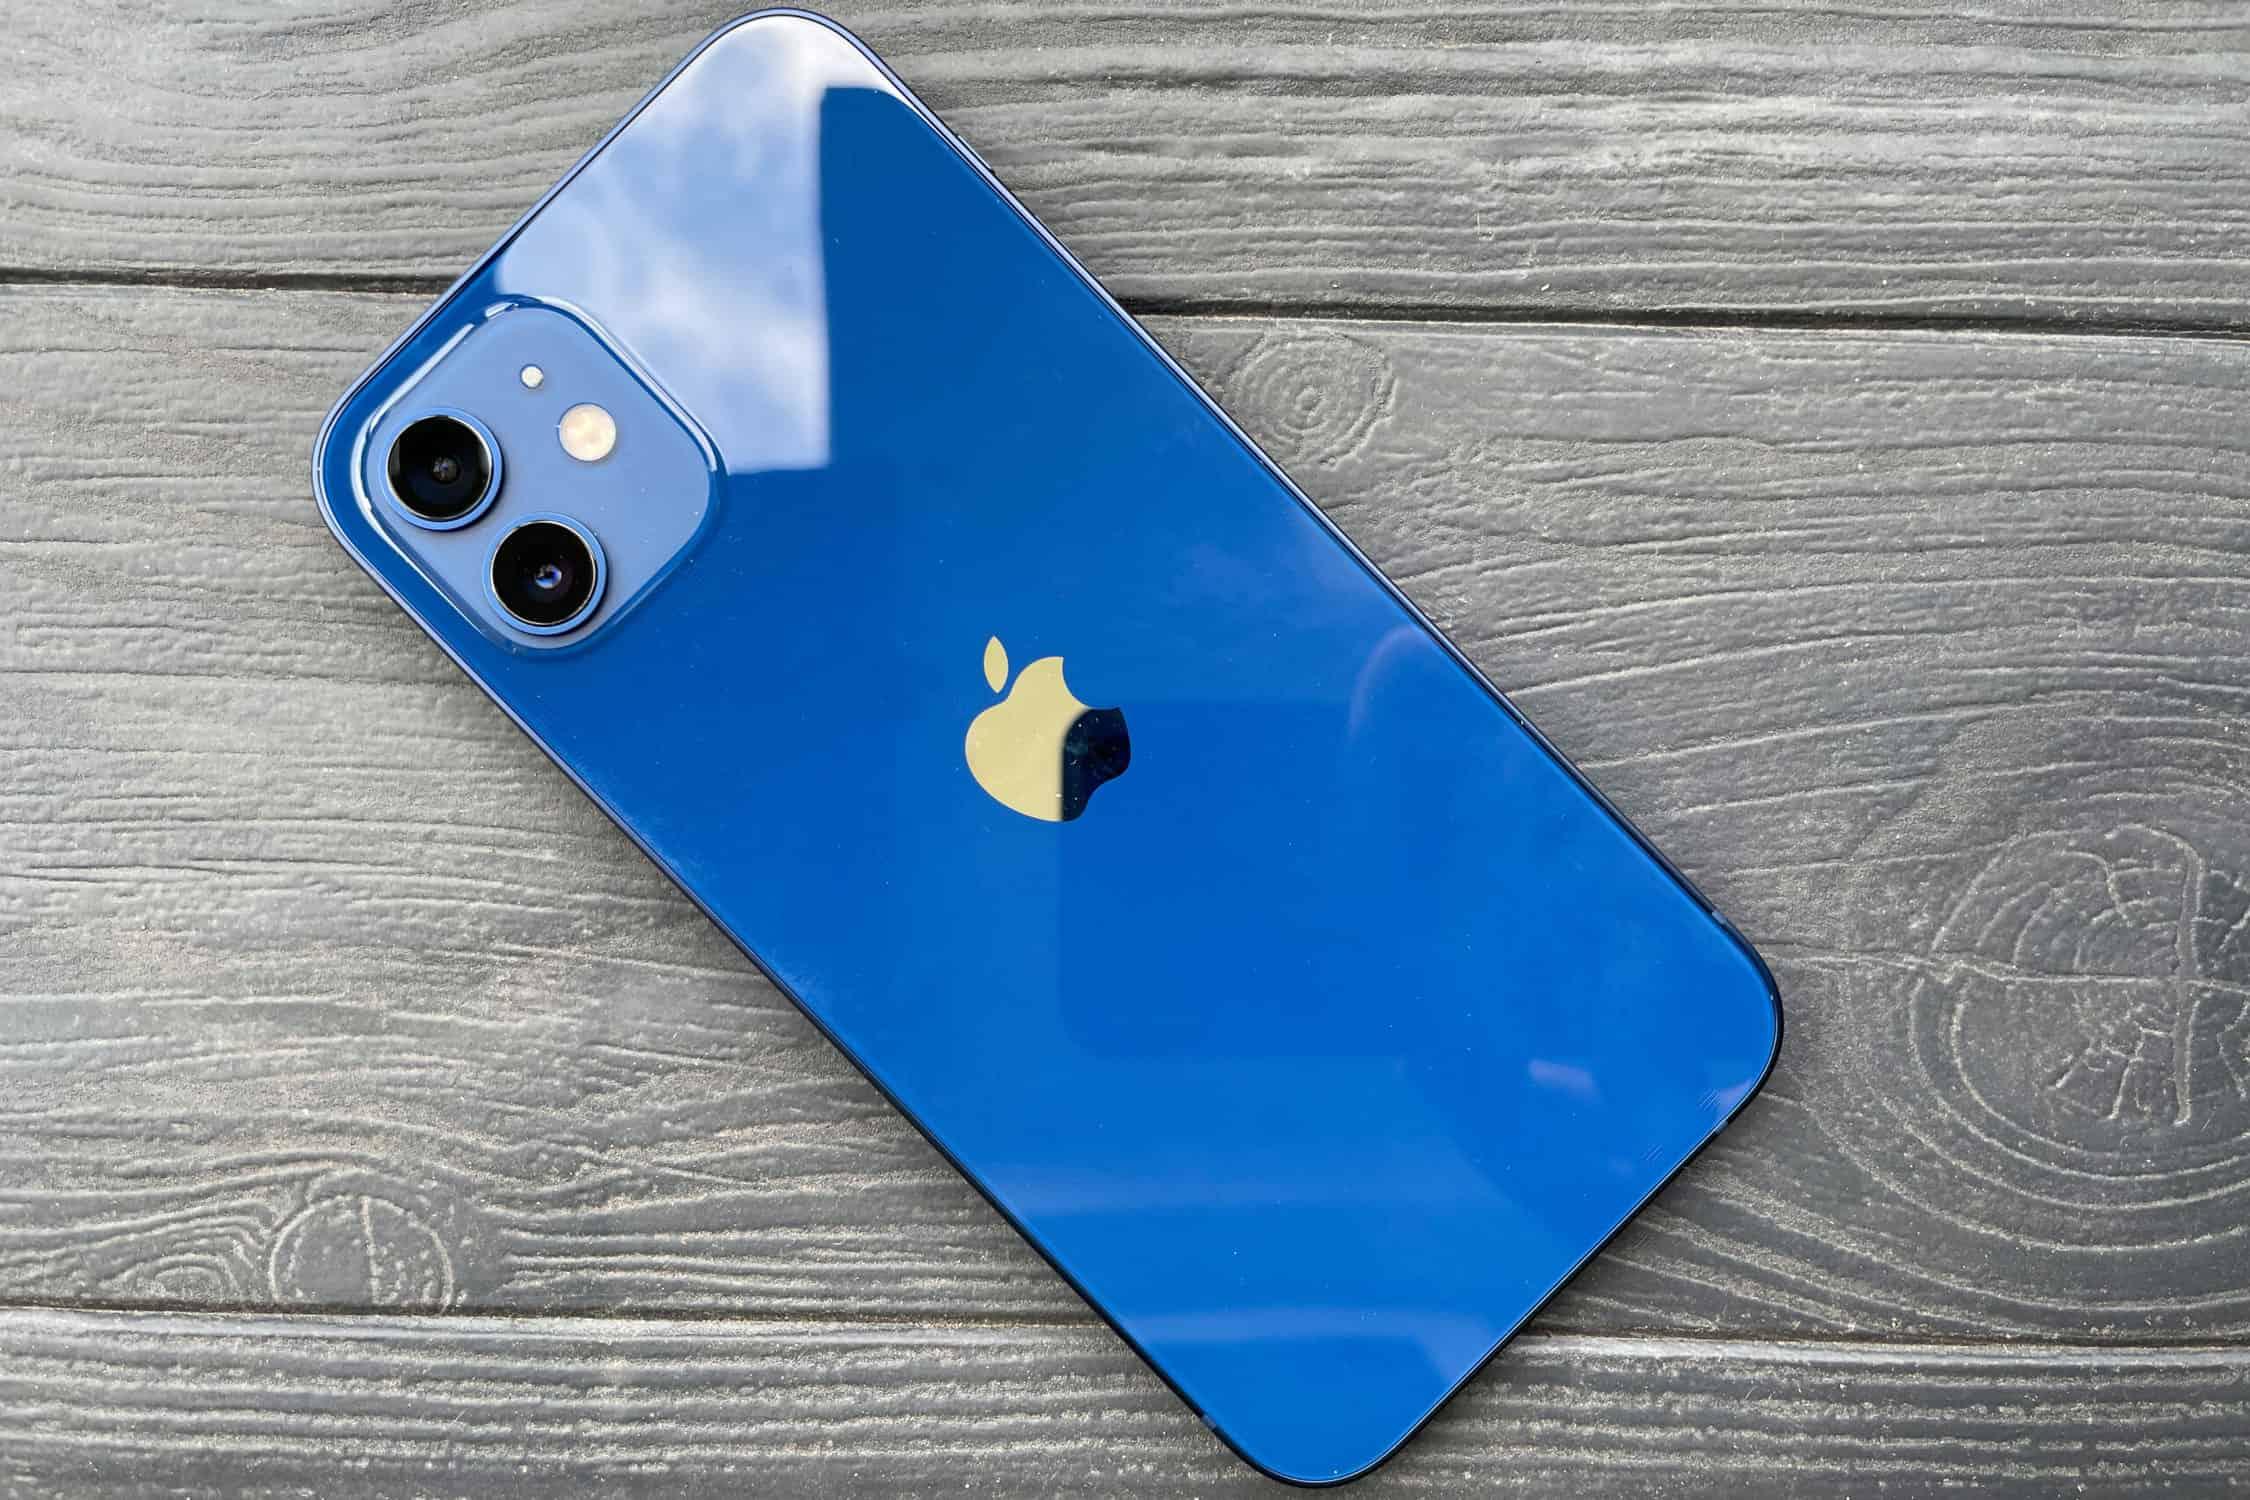 Mặt lưng iPhone 12